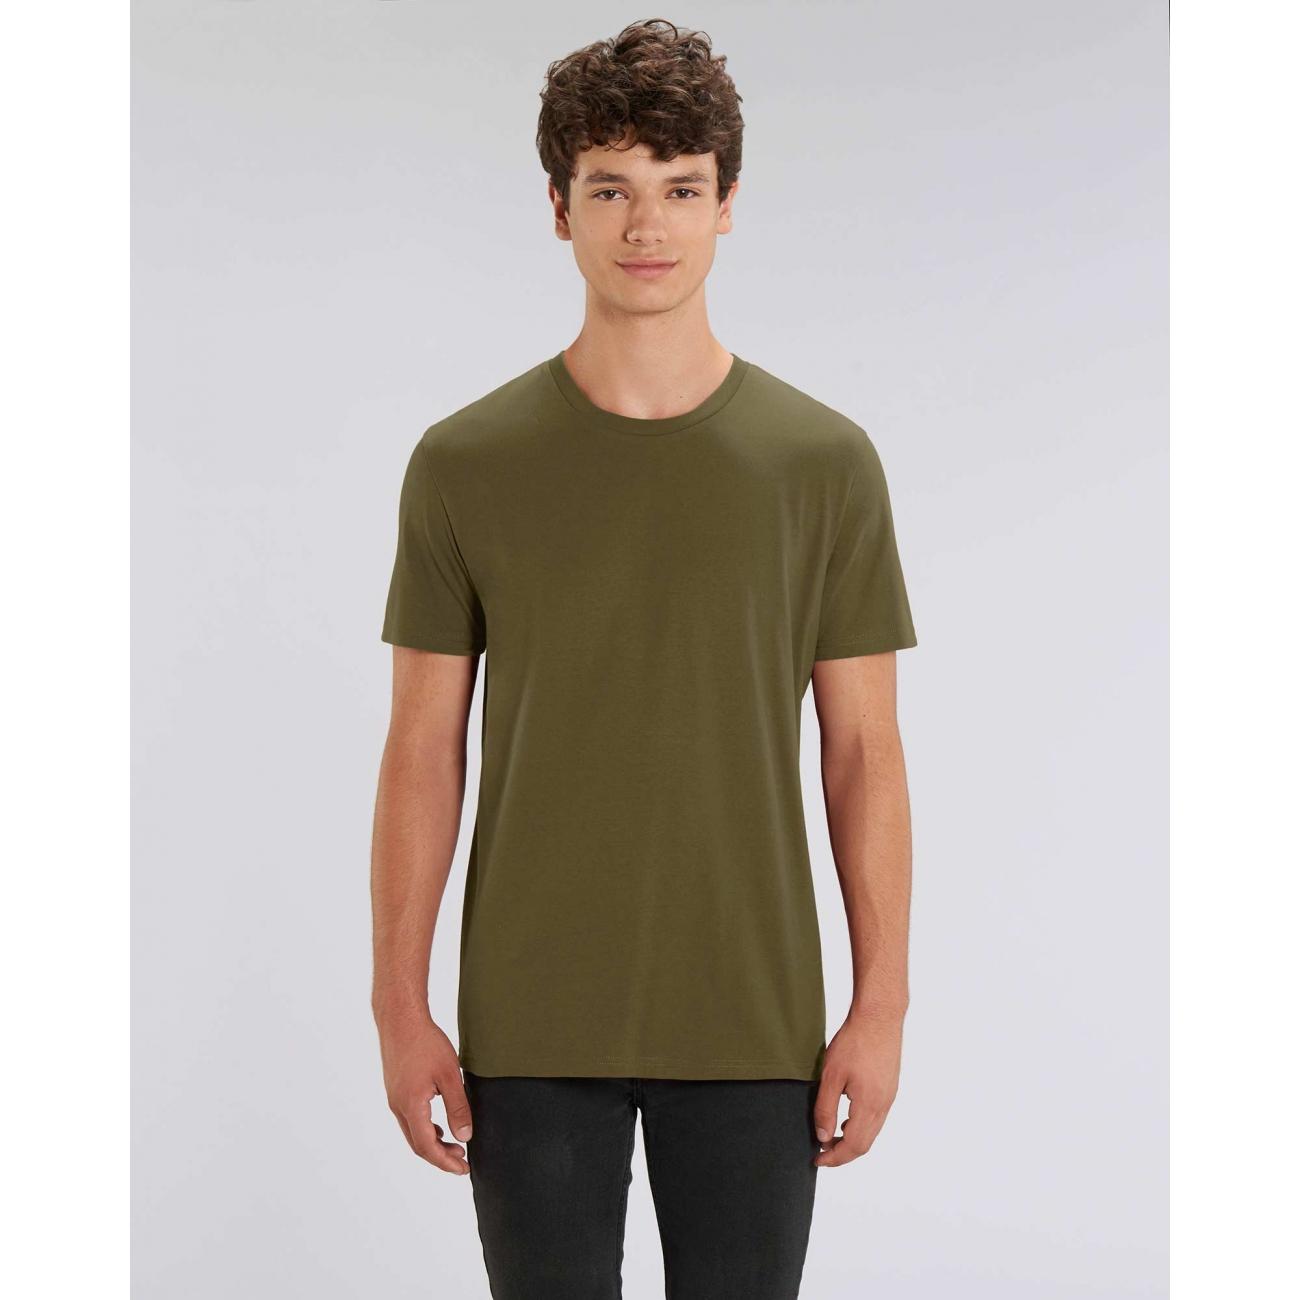 https://tee-shirt-bio.com/9623-thickbox_default/tee-shirt-classique-col-rond-homme-en-coton-bio-fwf-kaki-anglais.jpg